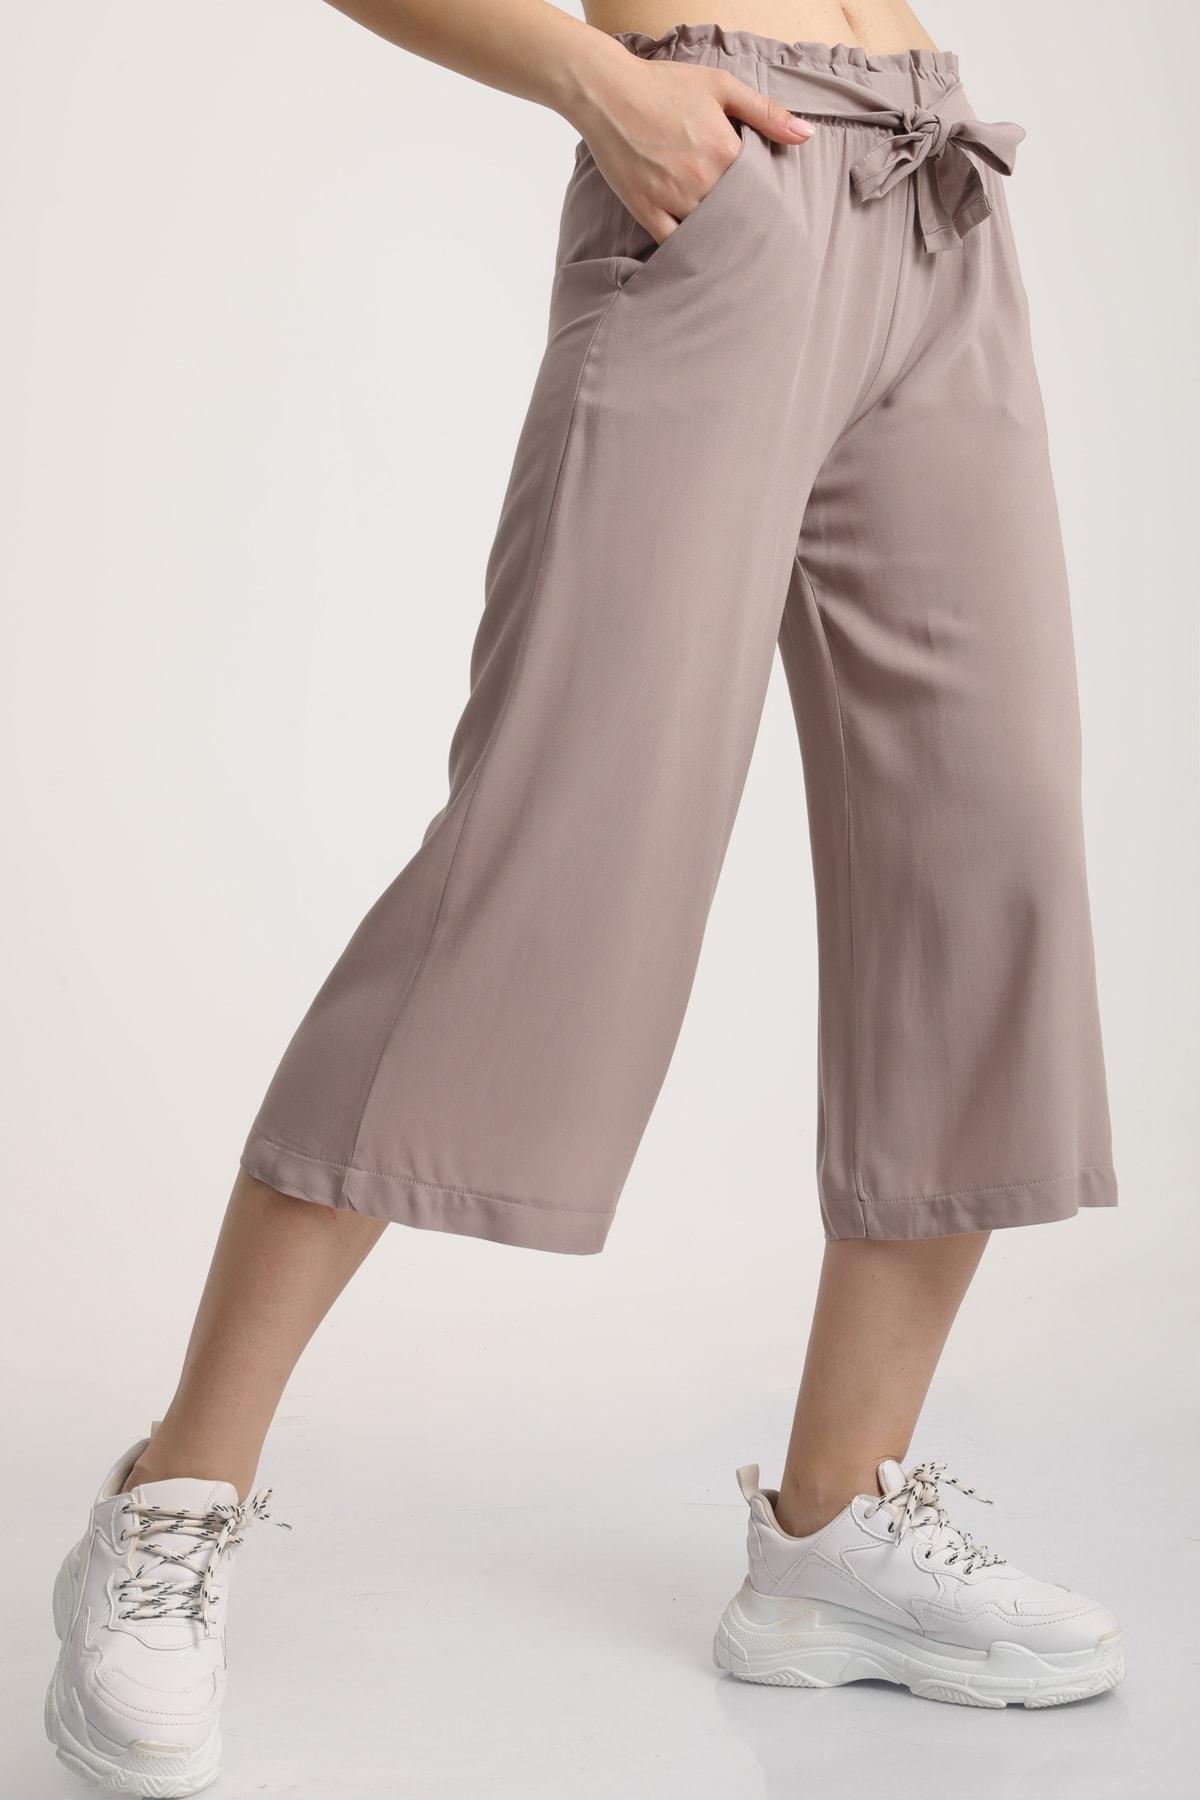 MD trend Kadın Taş Bel Lastikli Bağlamalı Kısa Pantolon Mdt5979 1